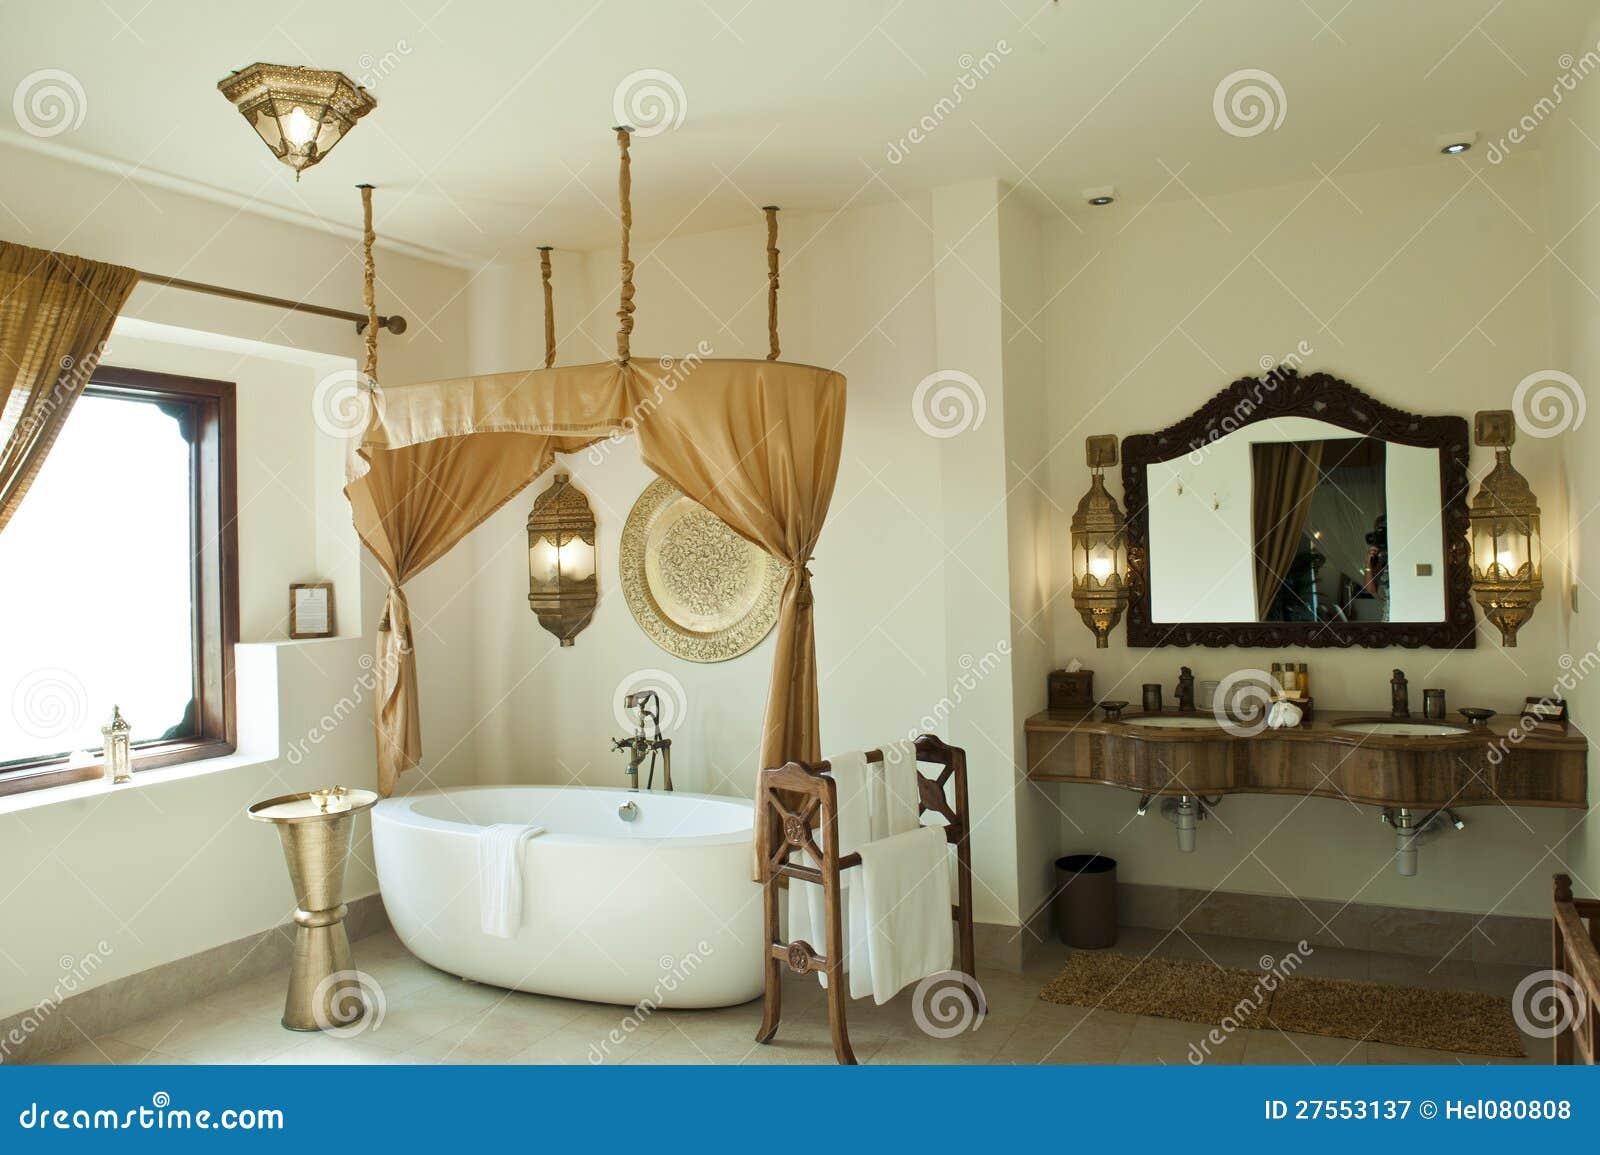 Luxury oriental hotel bathroom zanzibar stock image for Salle de bain orientale design